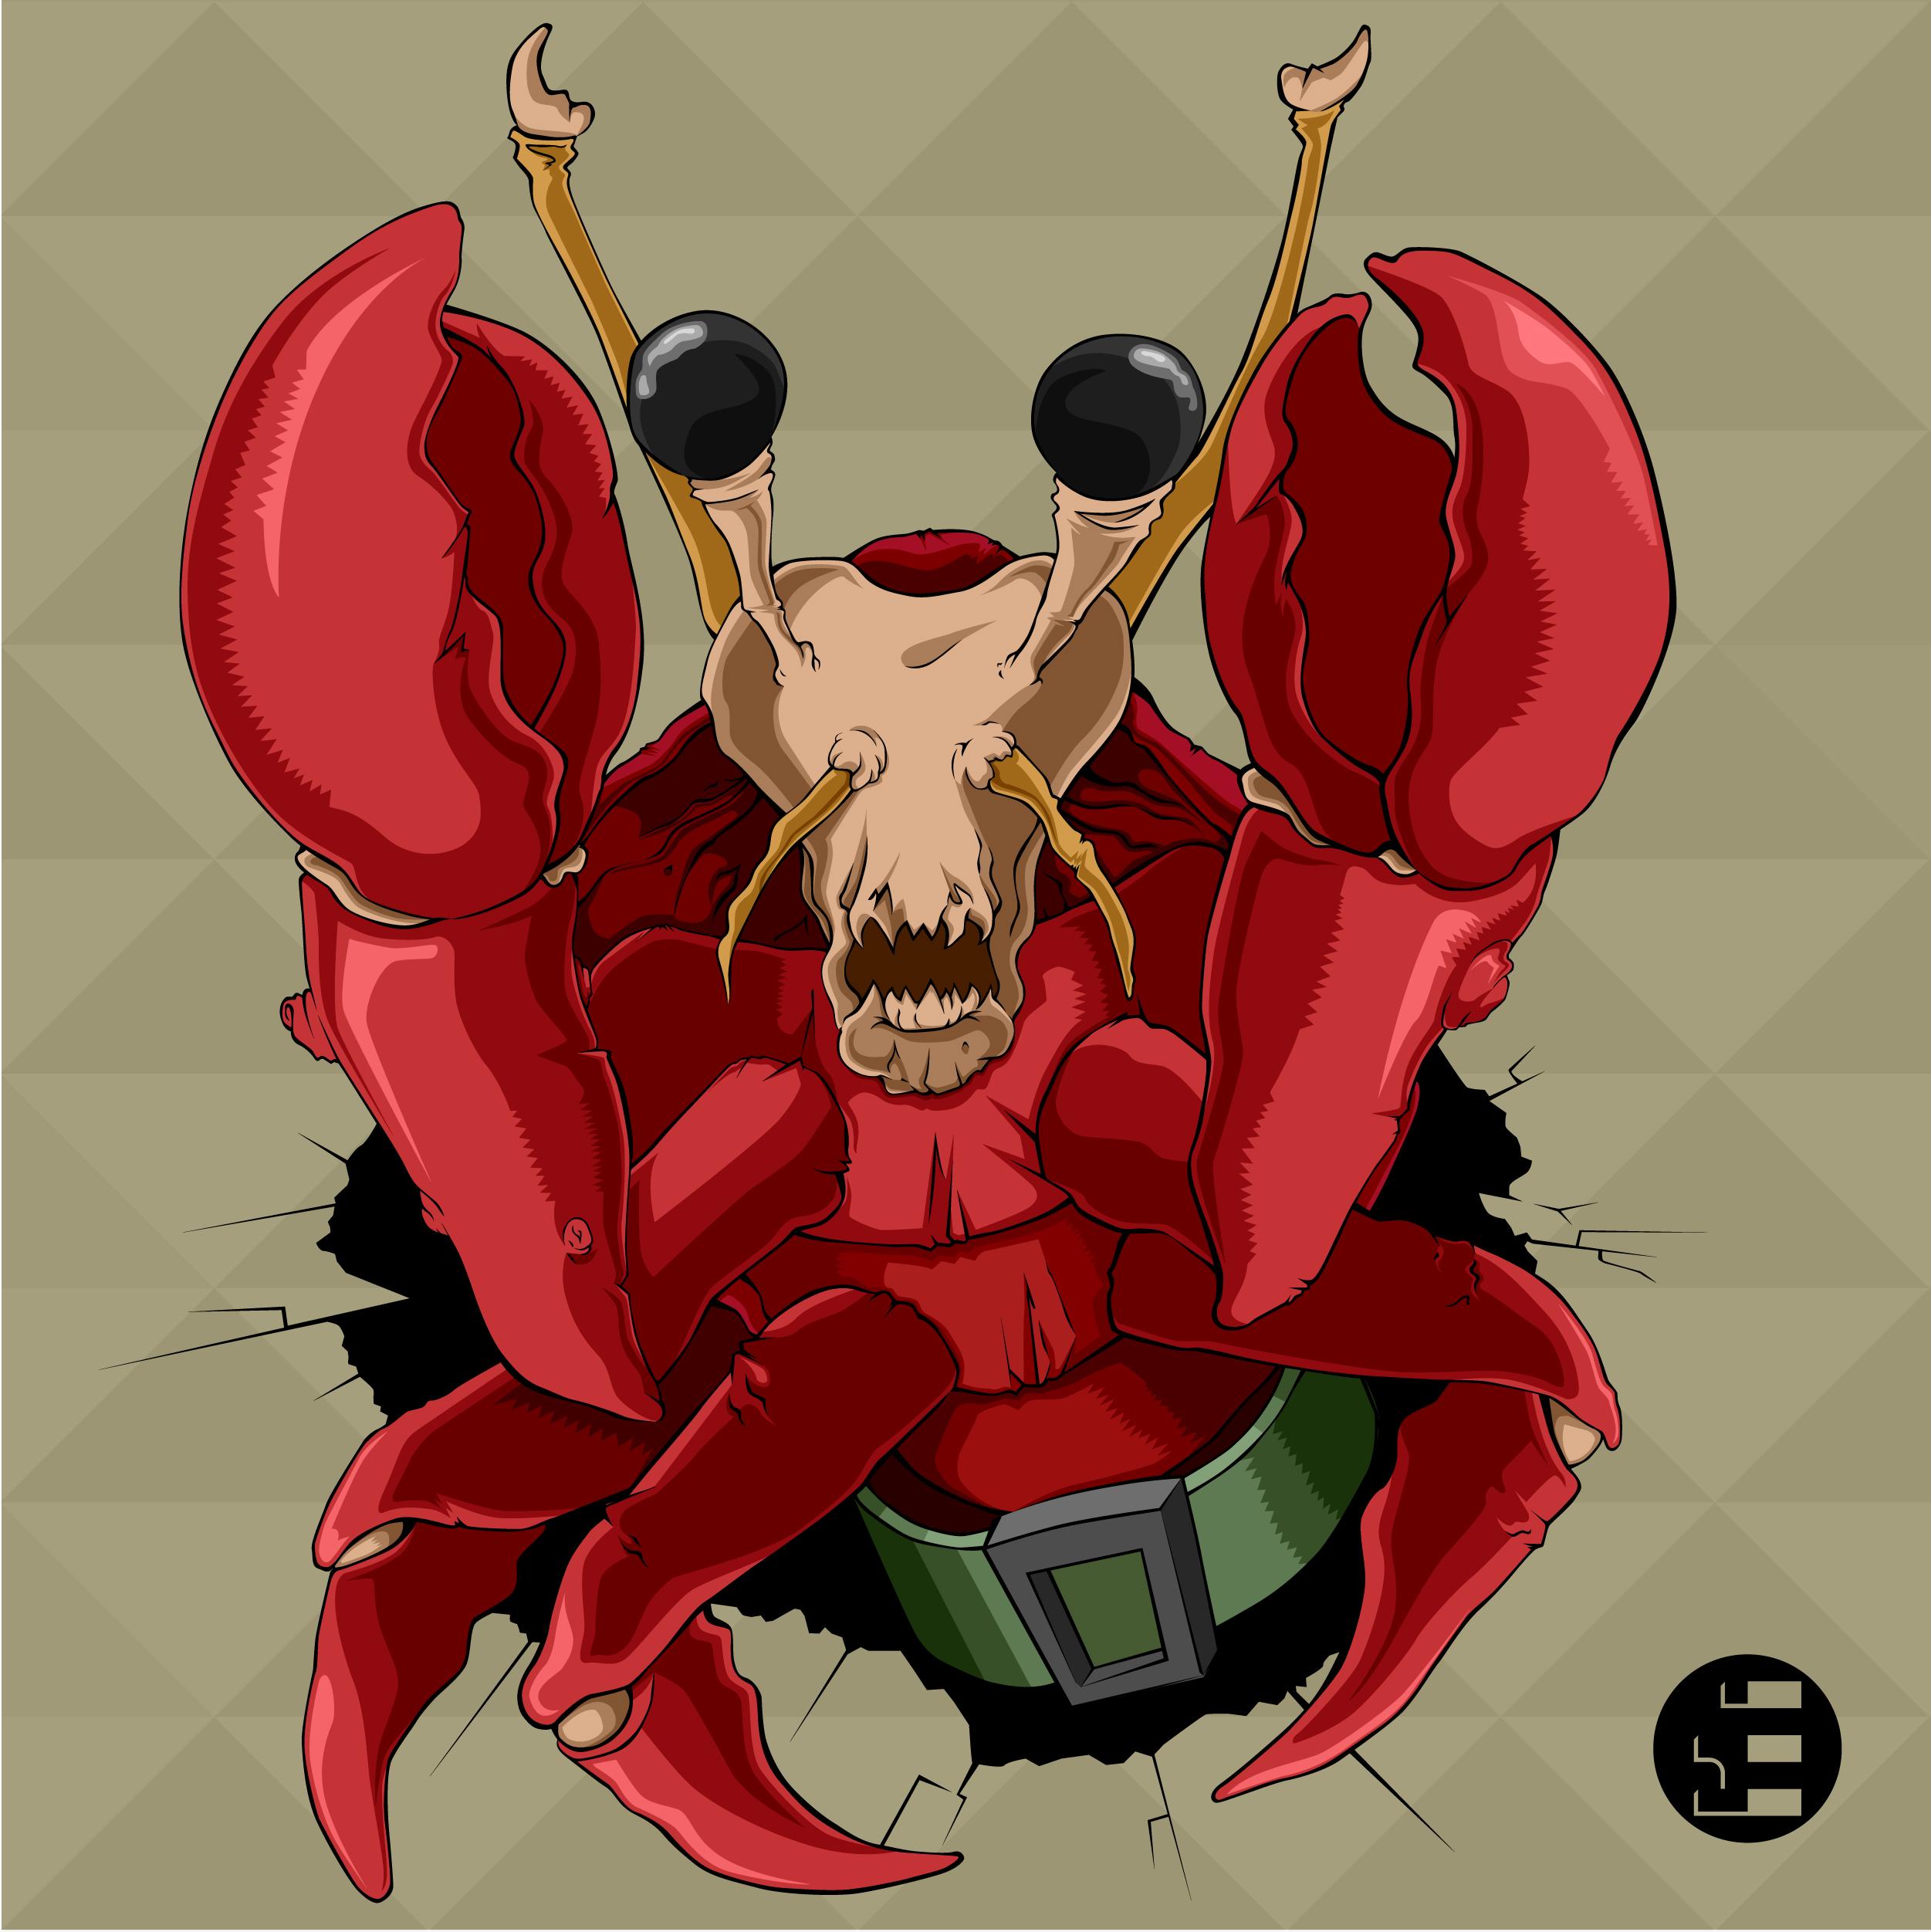 Crab people! Crab people!